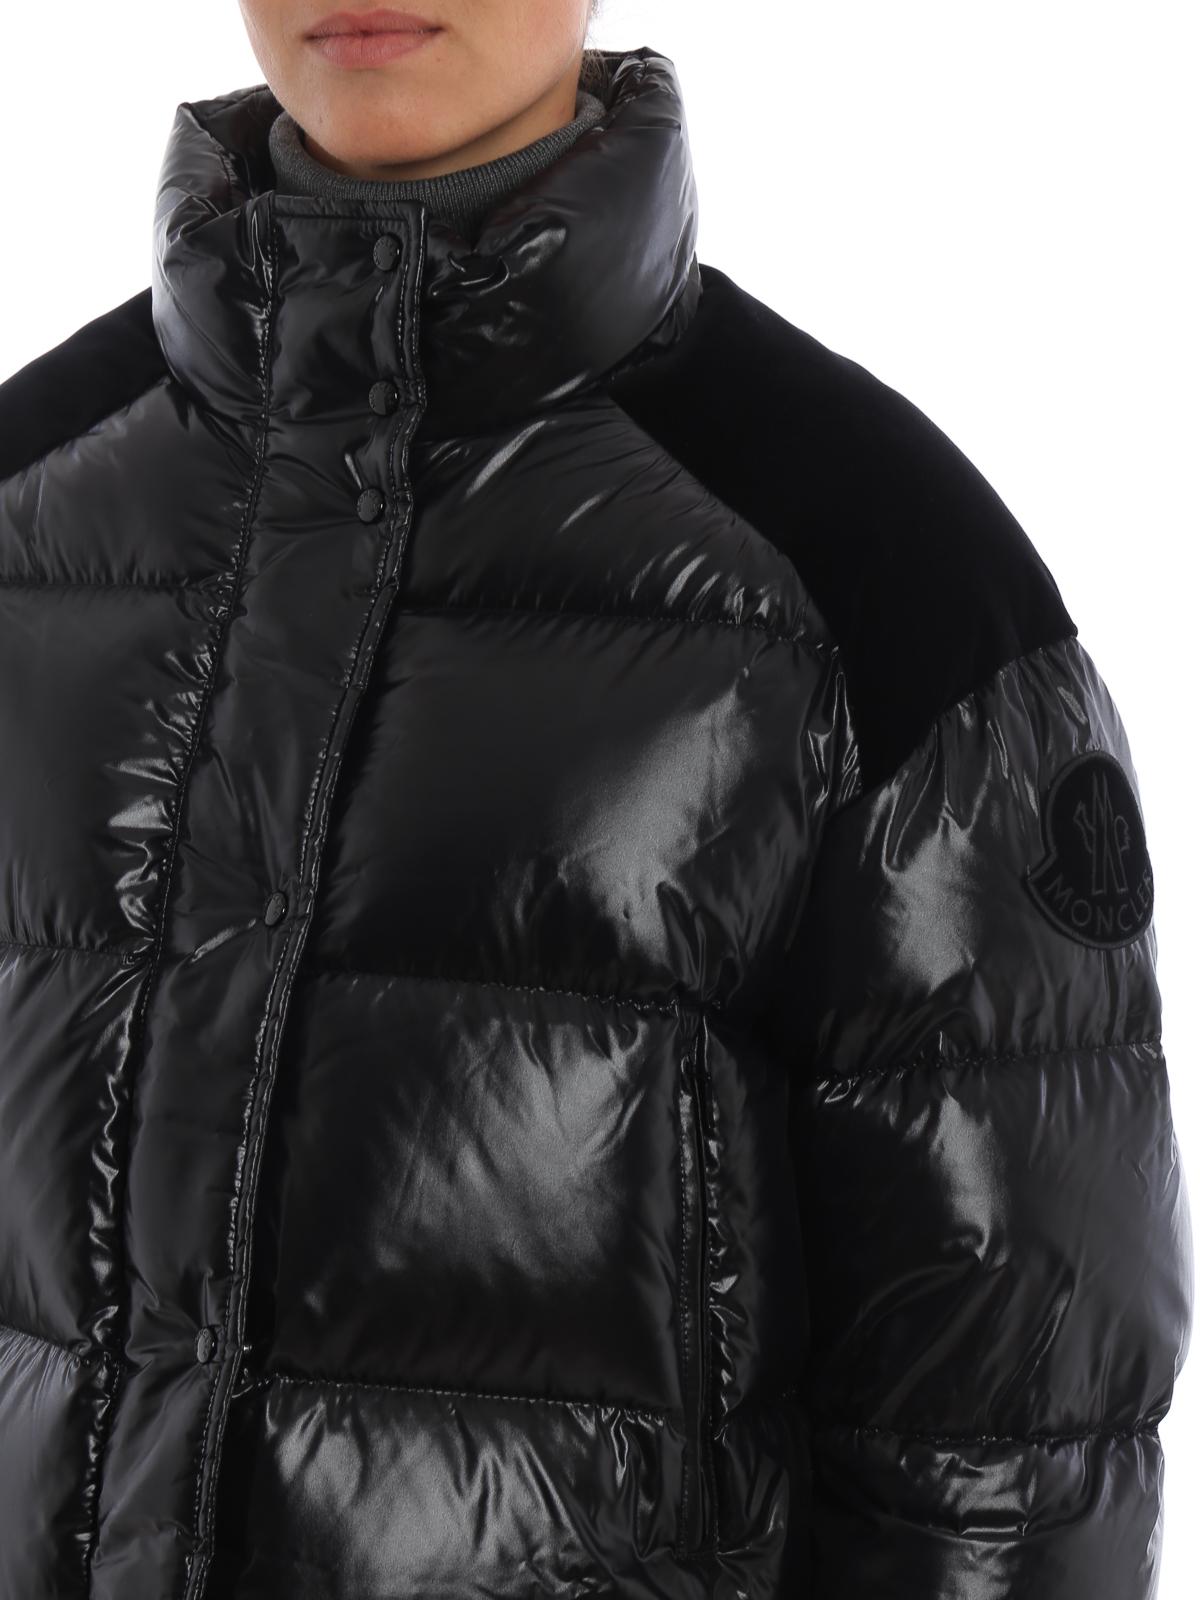 MONCLER buy online 2 Moncler 1952 Genius Chouette puffer jacket